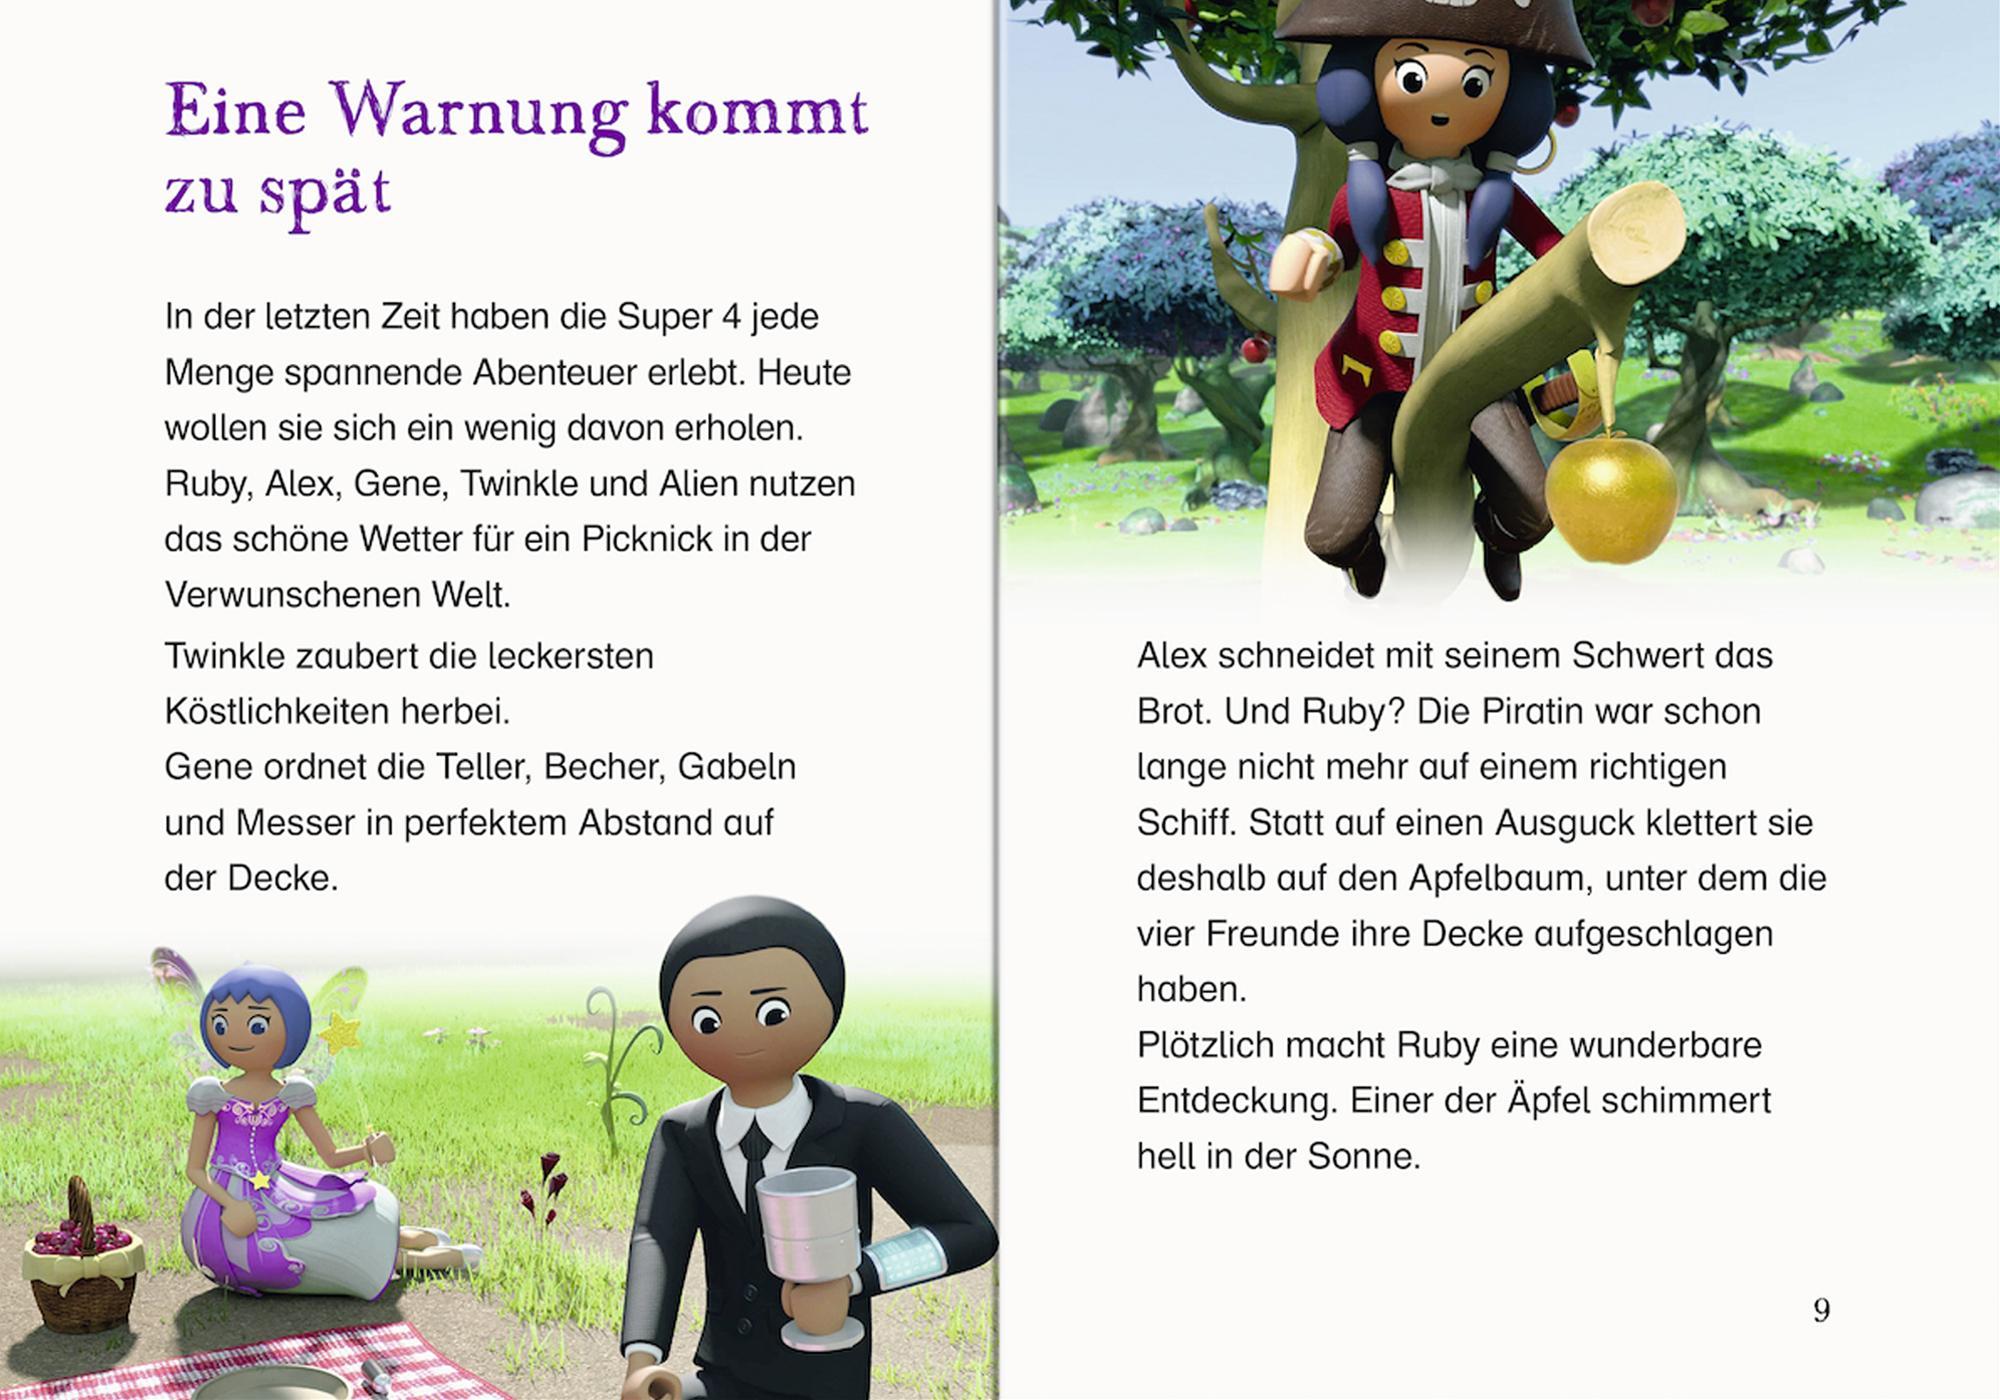 http://media.playmobil.com/i/playmobil/80485_product_extra1/Super 4: Erstleser - Die Königin der Piraten